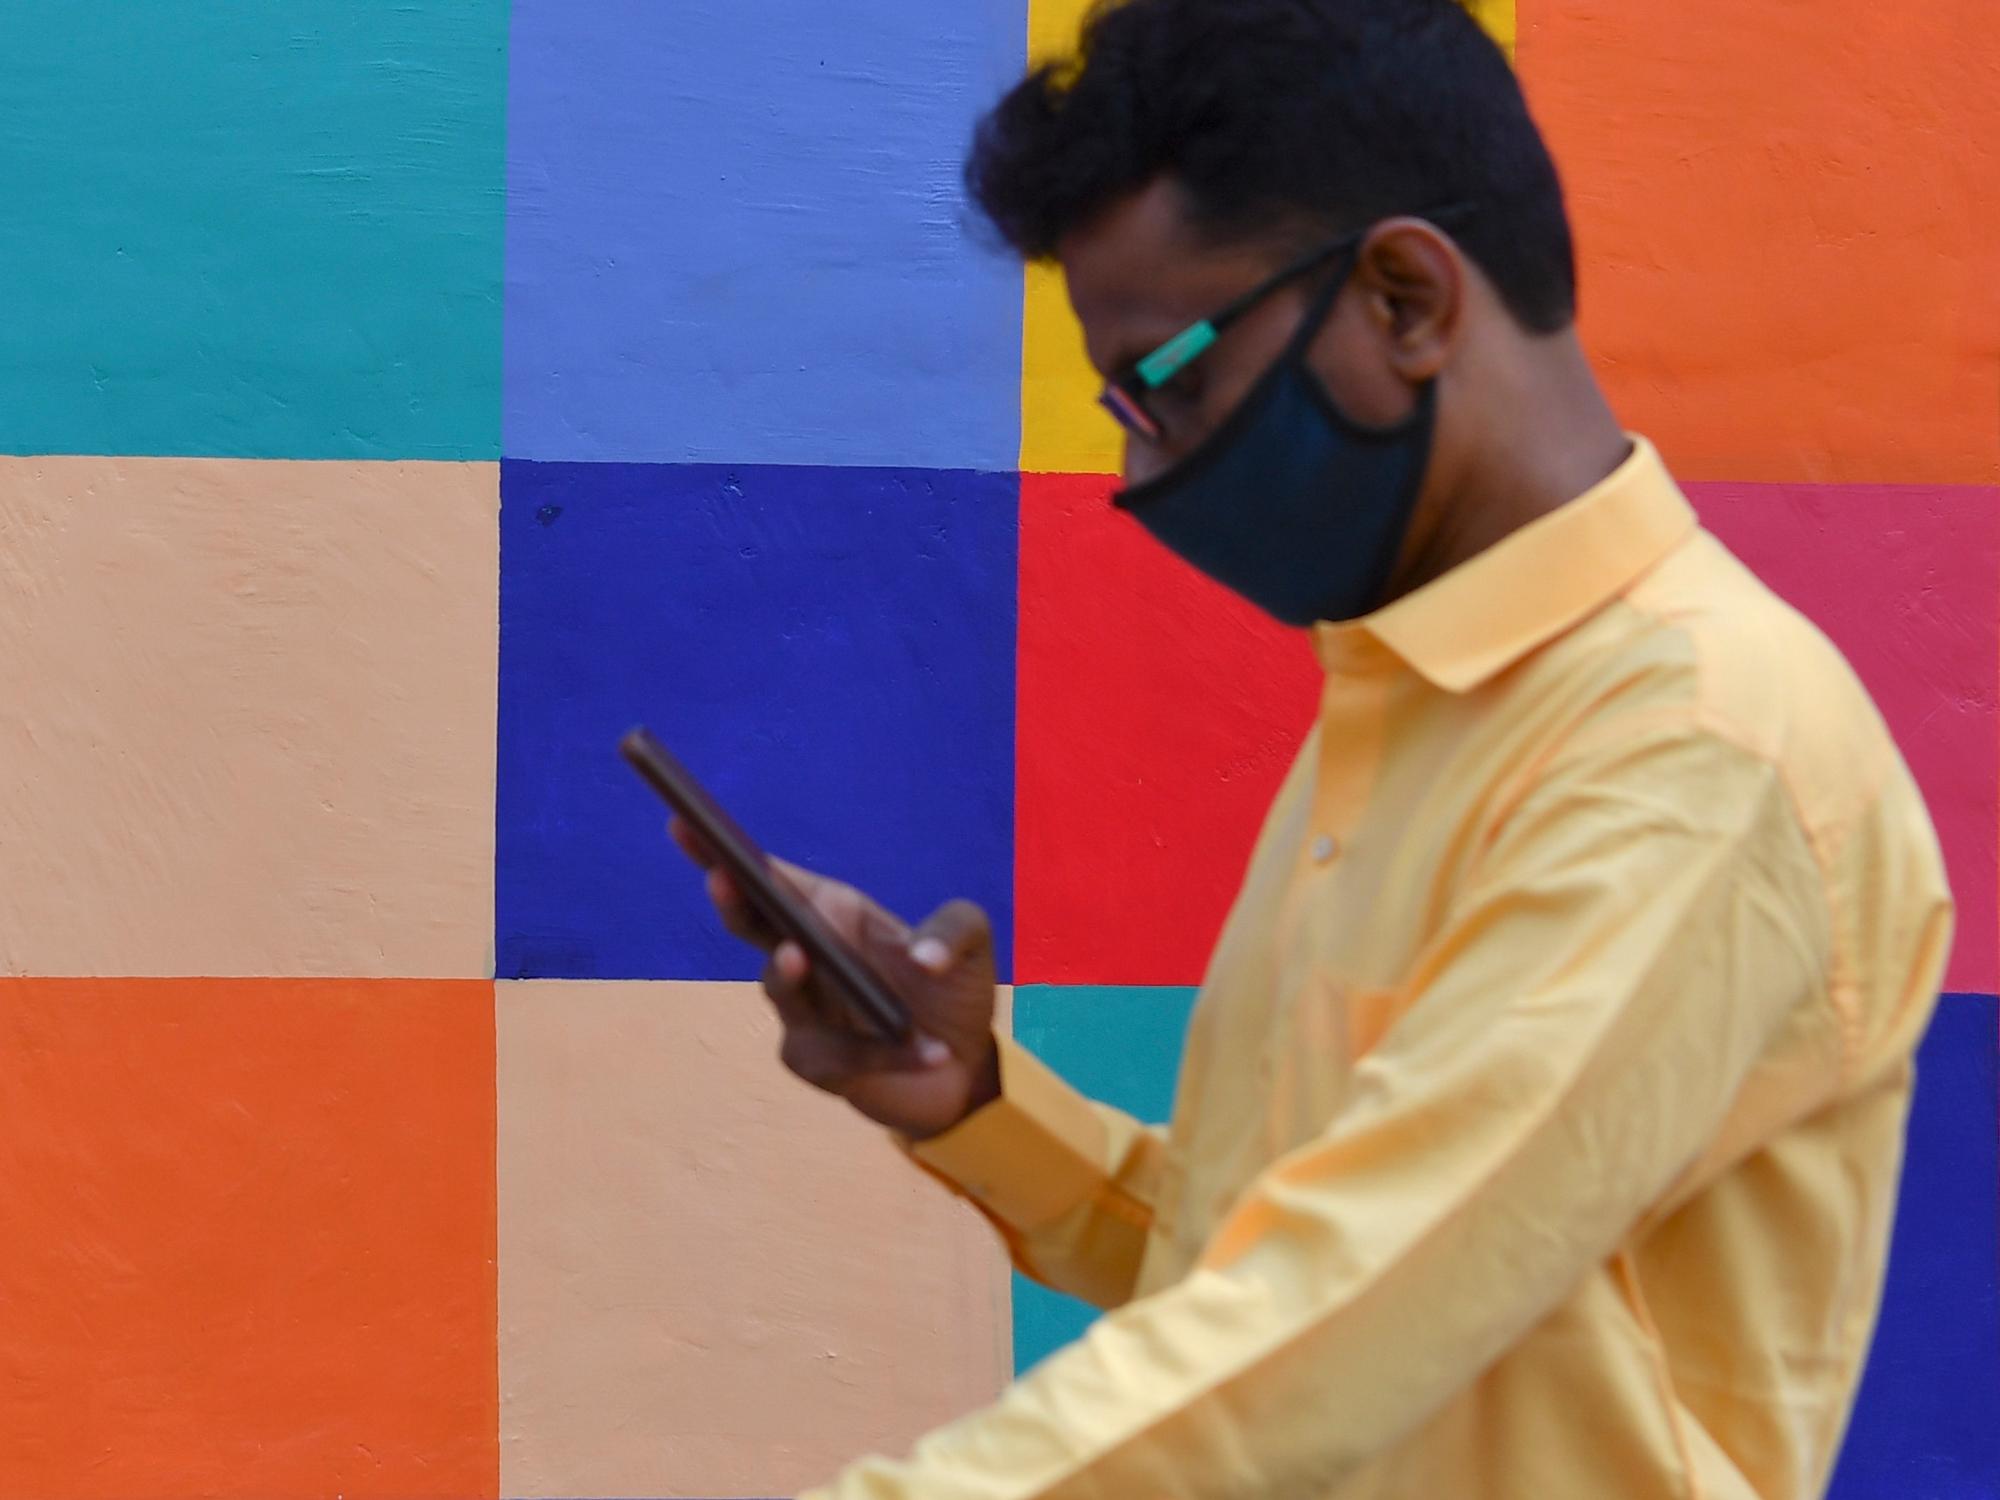 INDIA-ART-GENDER